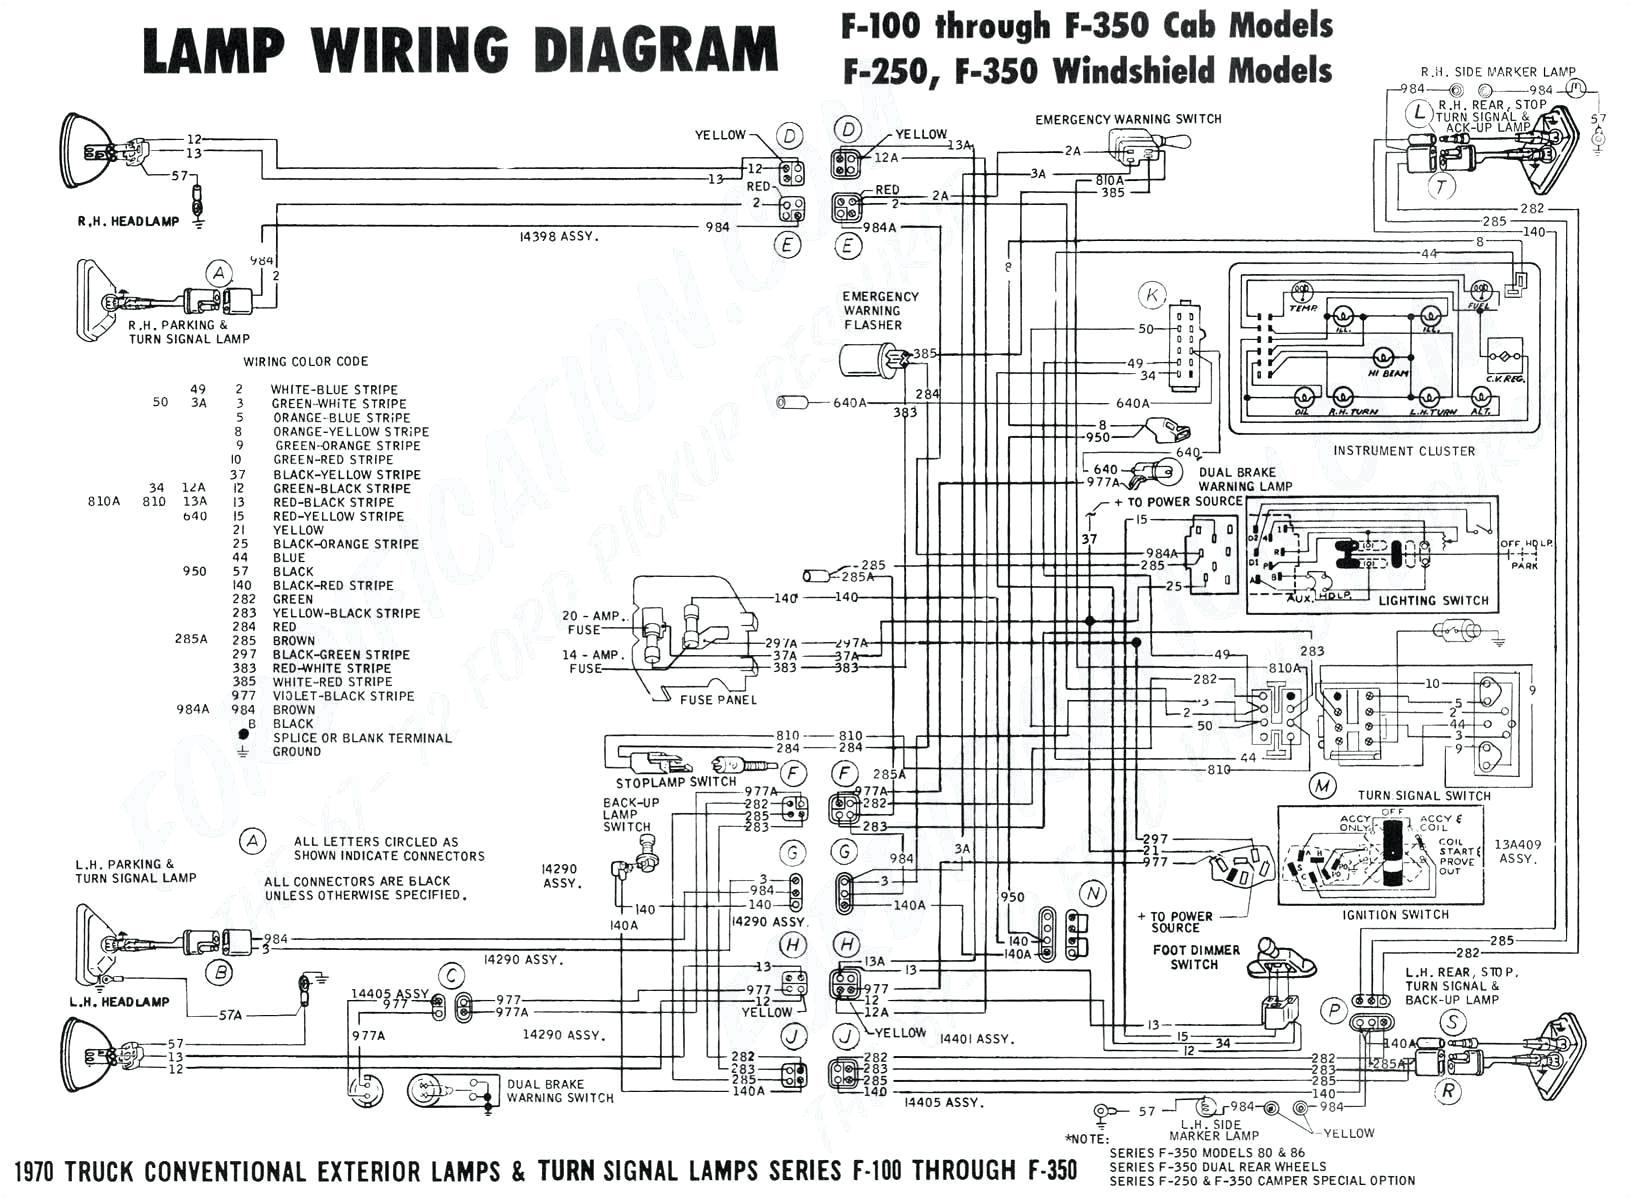 mag o wiring diagram wiring diagramsuzuki a50 wiring diagram wiring diagram1969 suzuki as50 wiring diagram wiring